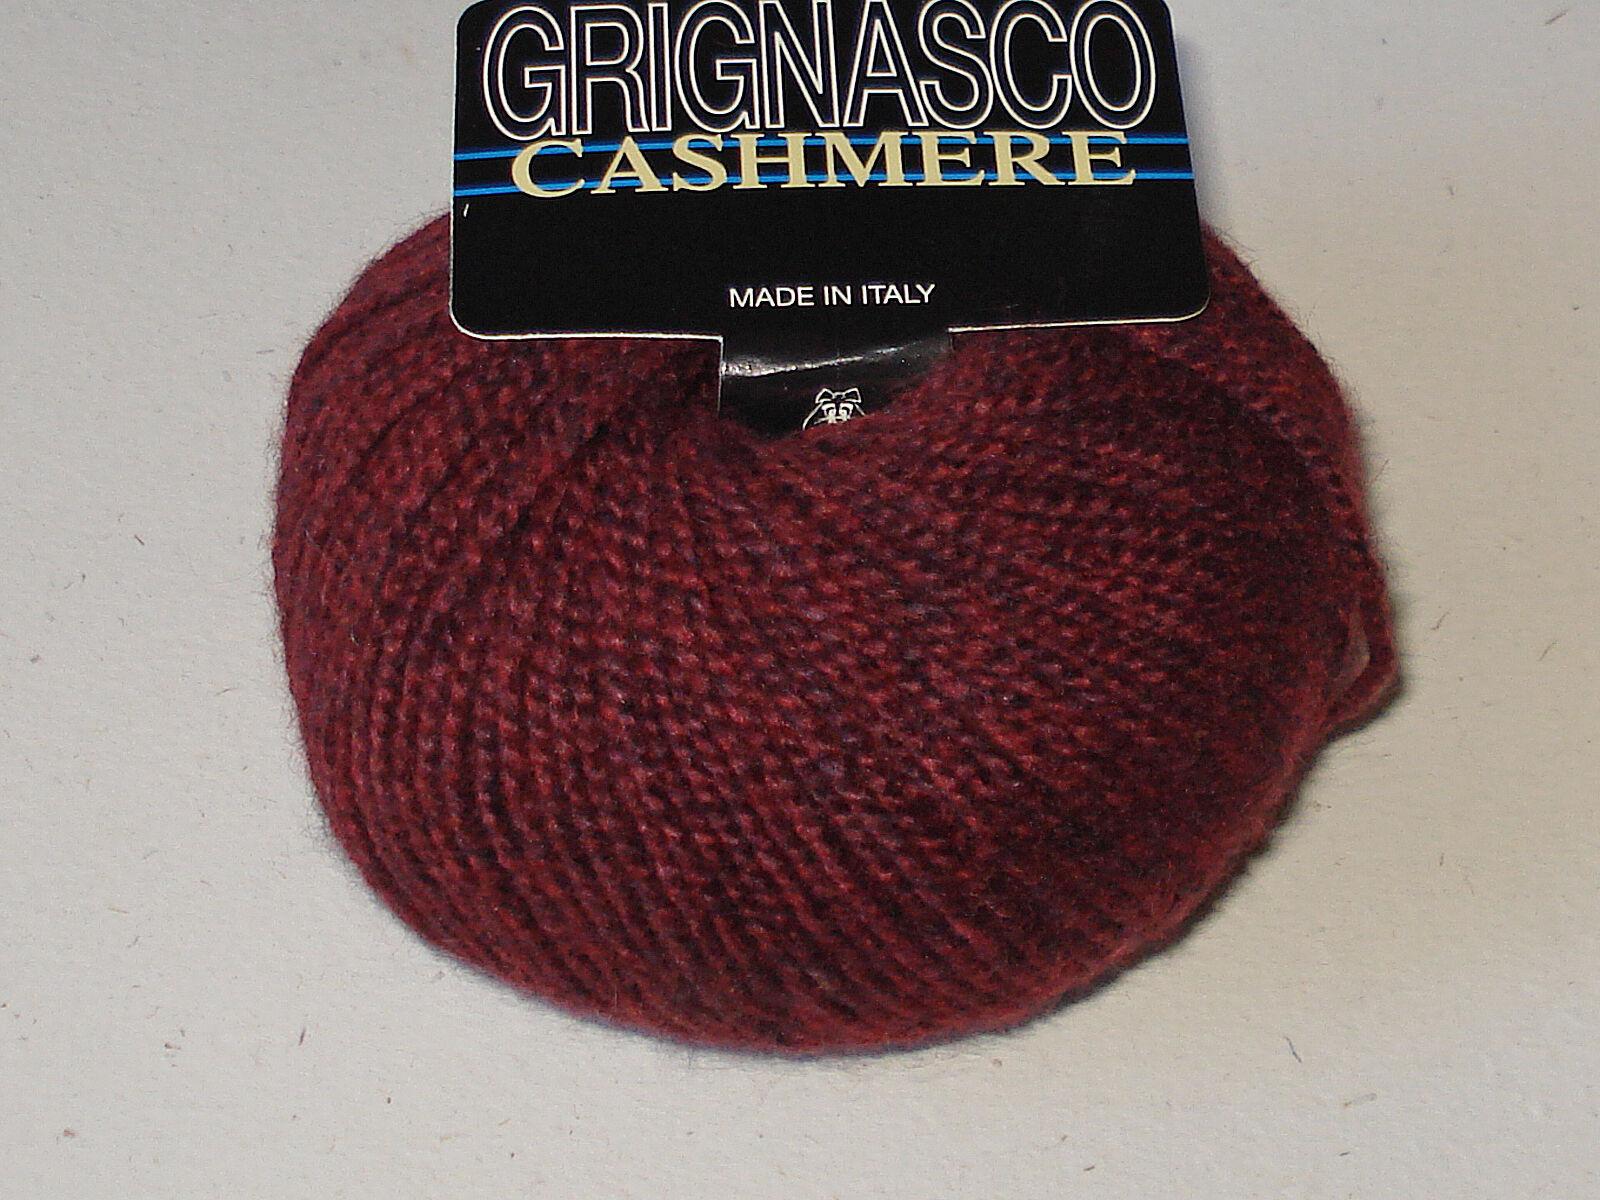 Grignasco 100% Fine Italian Cashmere Yarn Deep Heathered Red Wine Singles